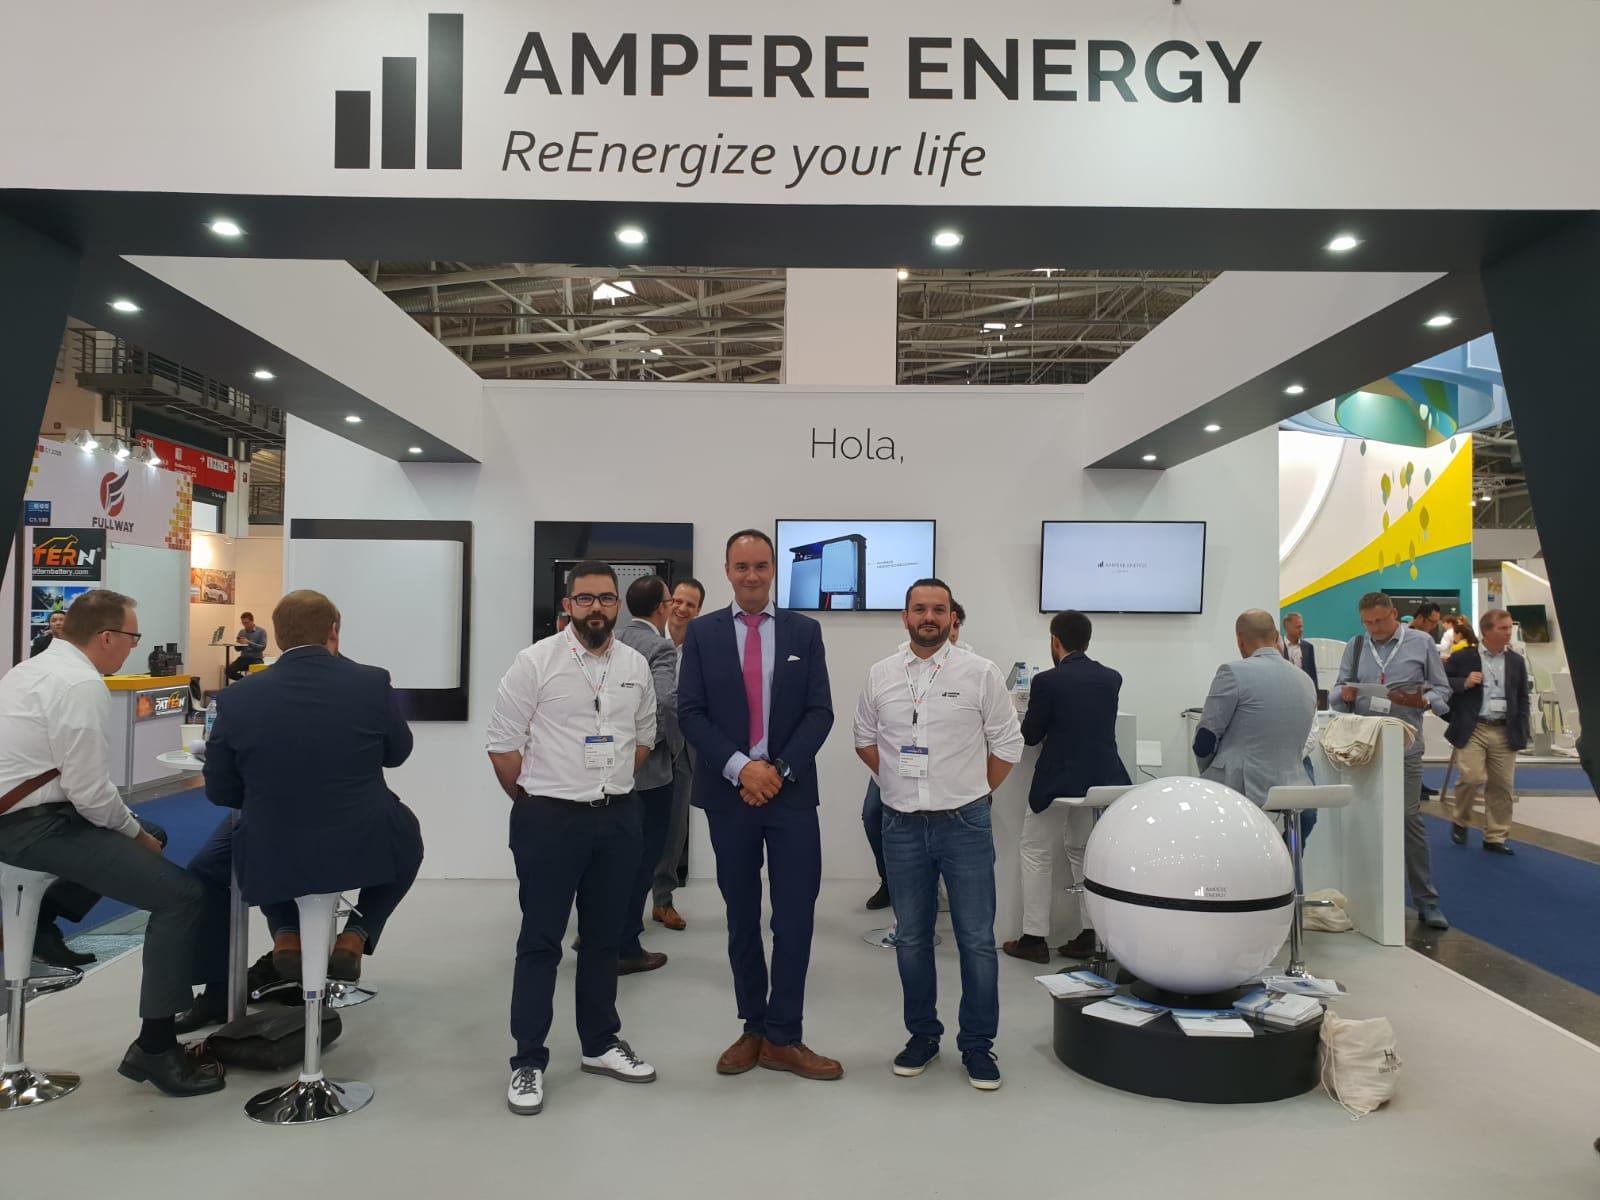 Stand de Ampere Energy en Intersolar